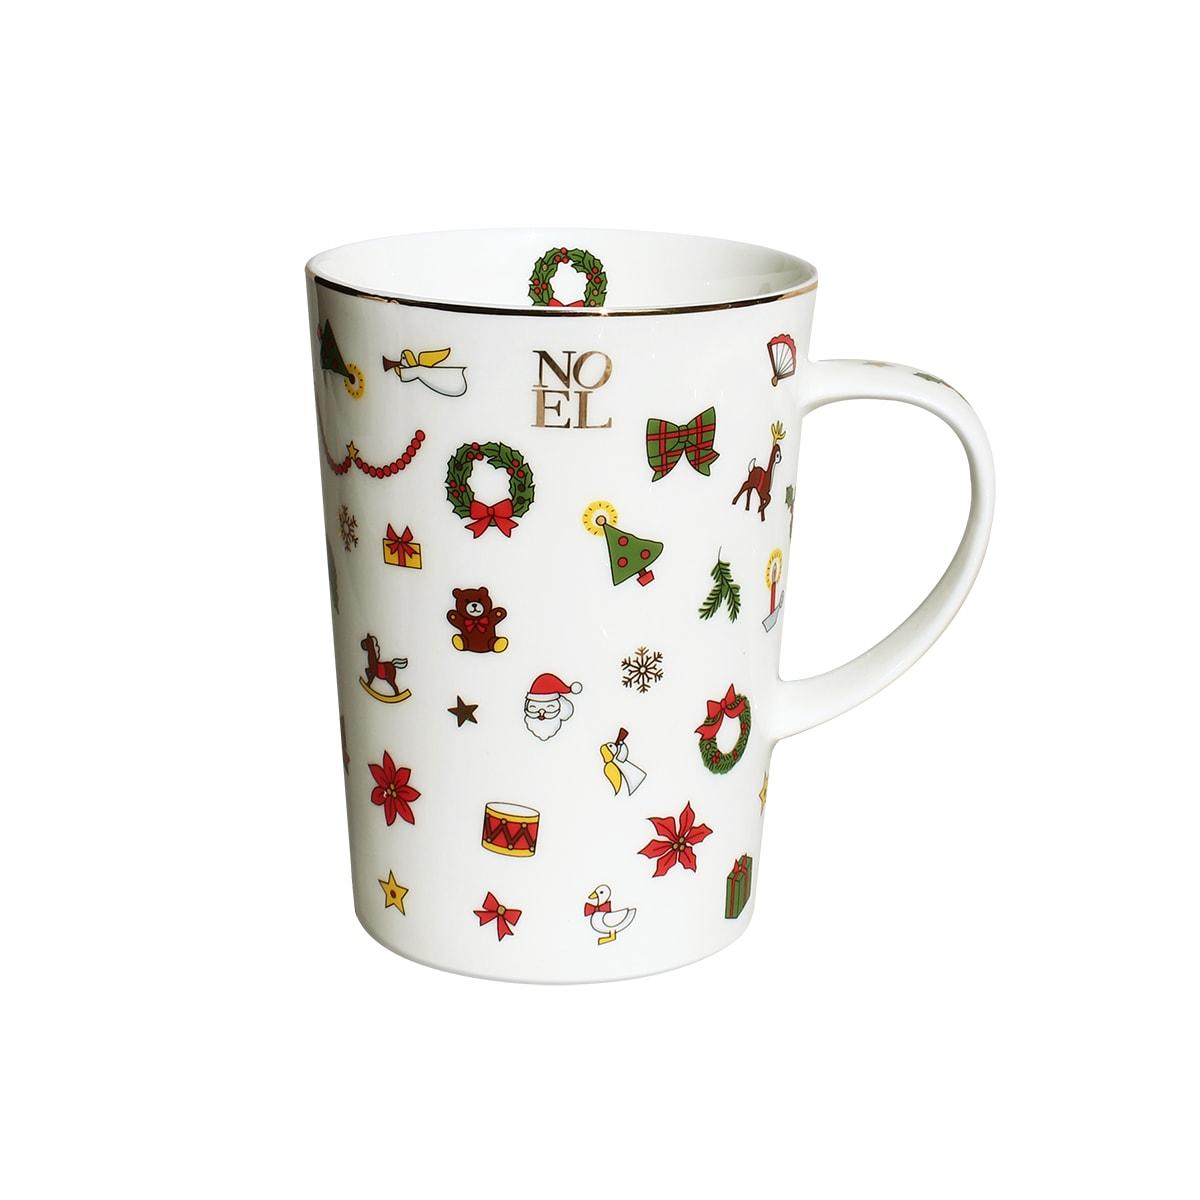 Set of 2 Mugs - Noel Oro Collection